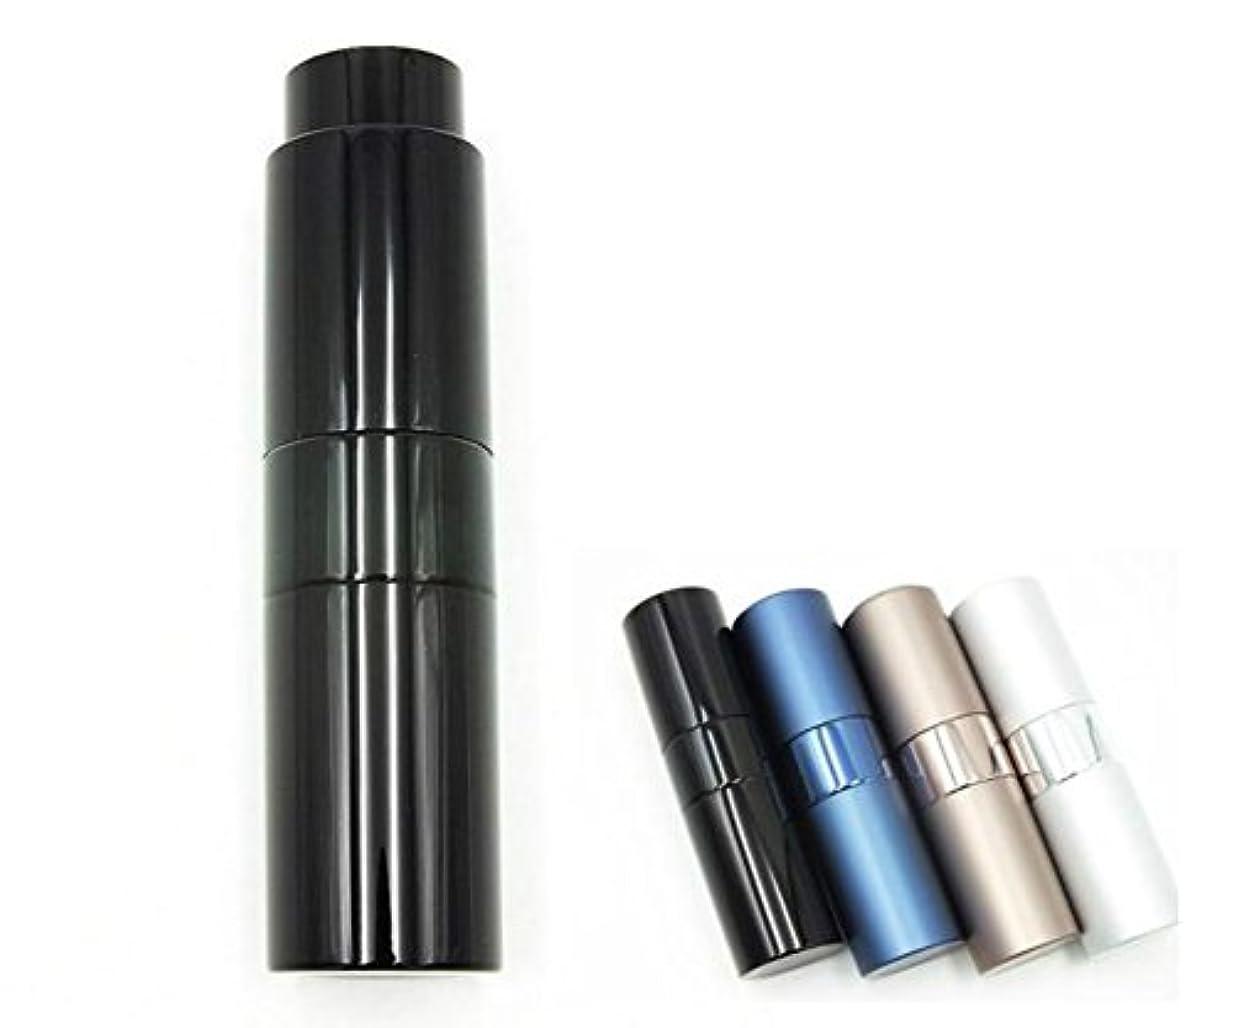 ShopXJ 香水 メンズ アトマイザー 大人 男性 プッシュ式 詰め替え 持ち運び 身だしなみ 携帯用 15ml (ブラック)